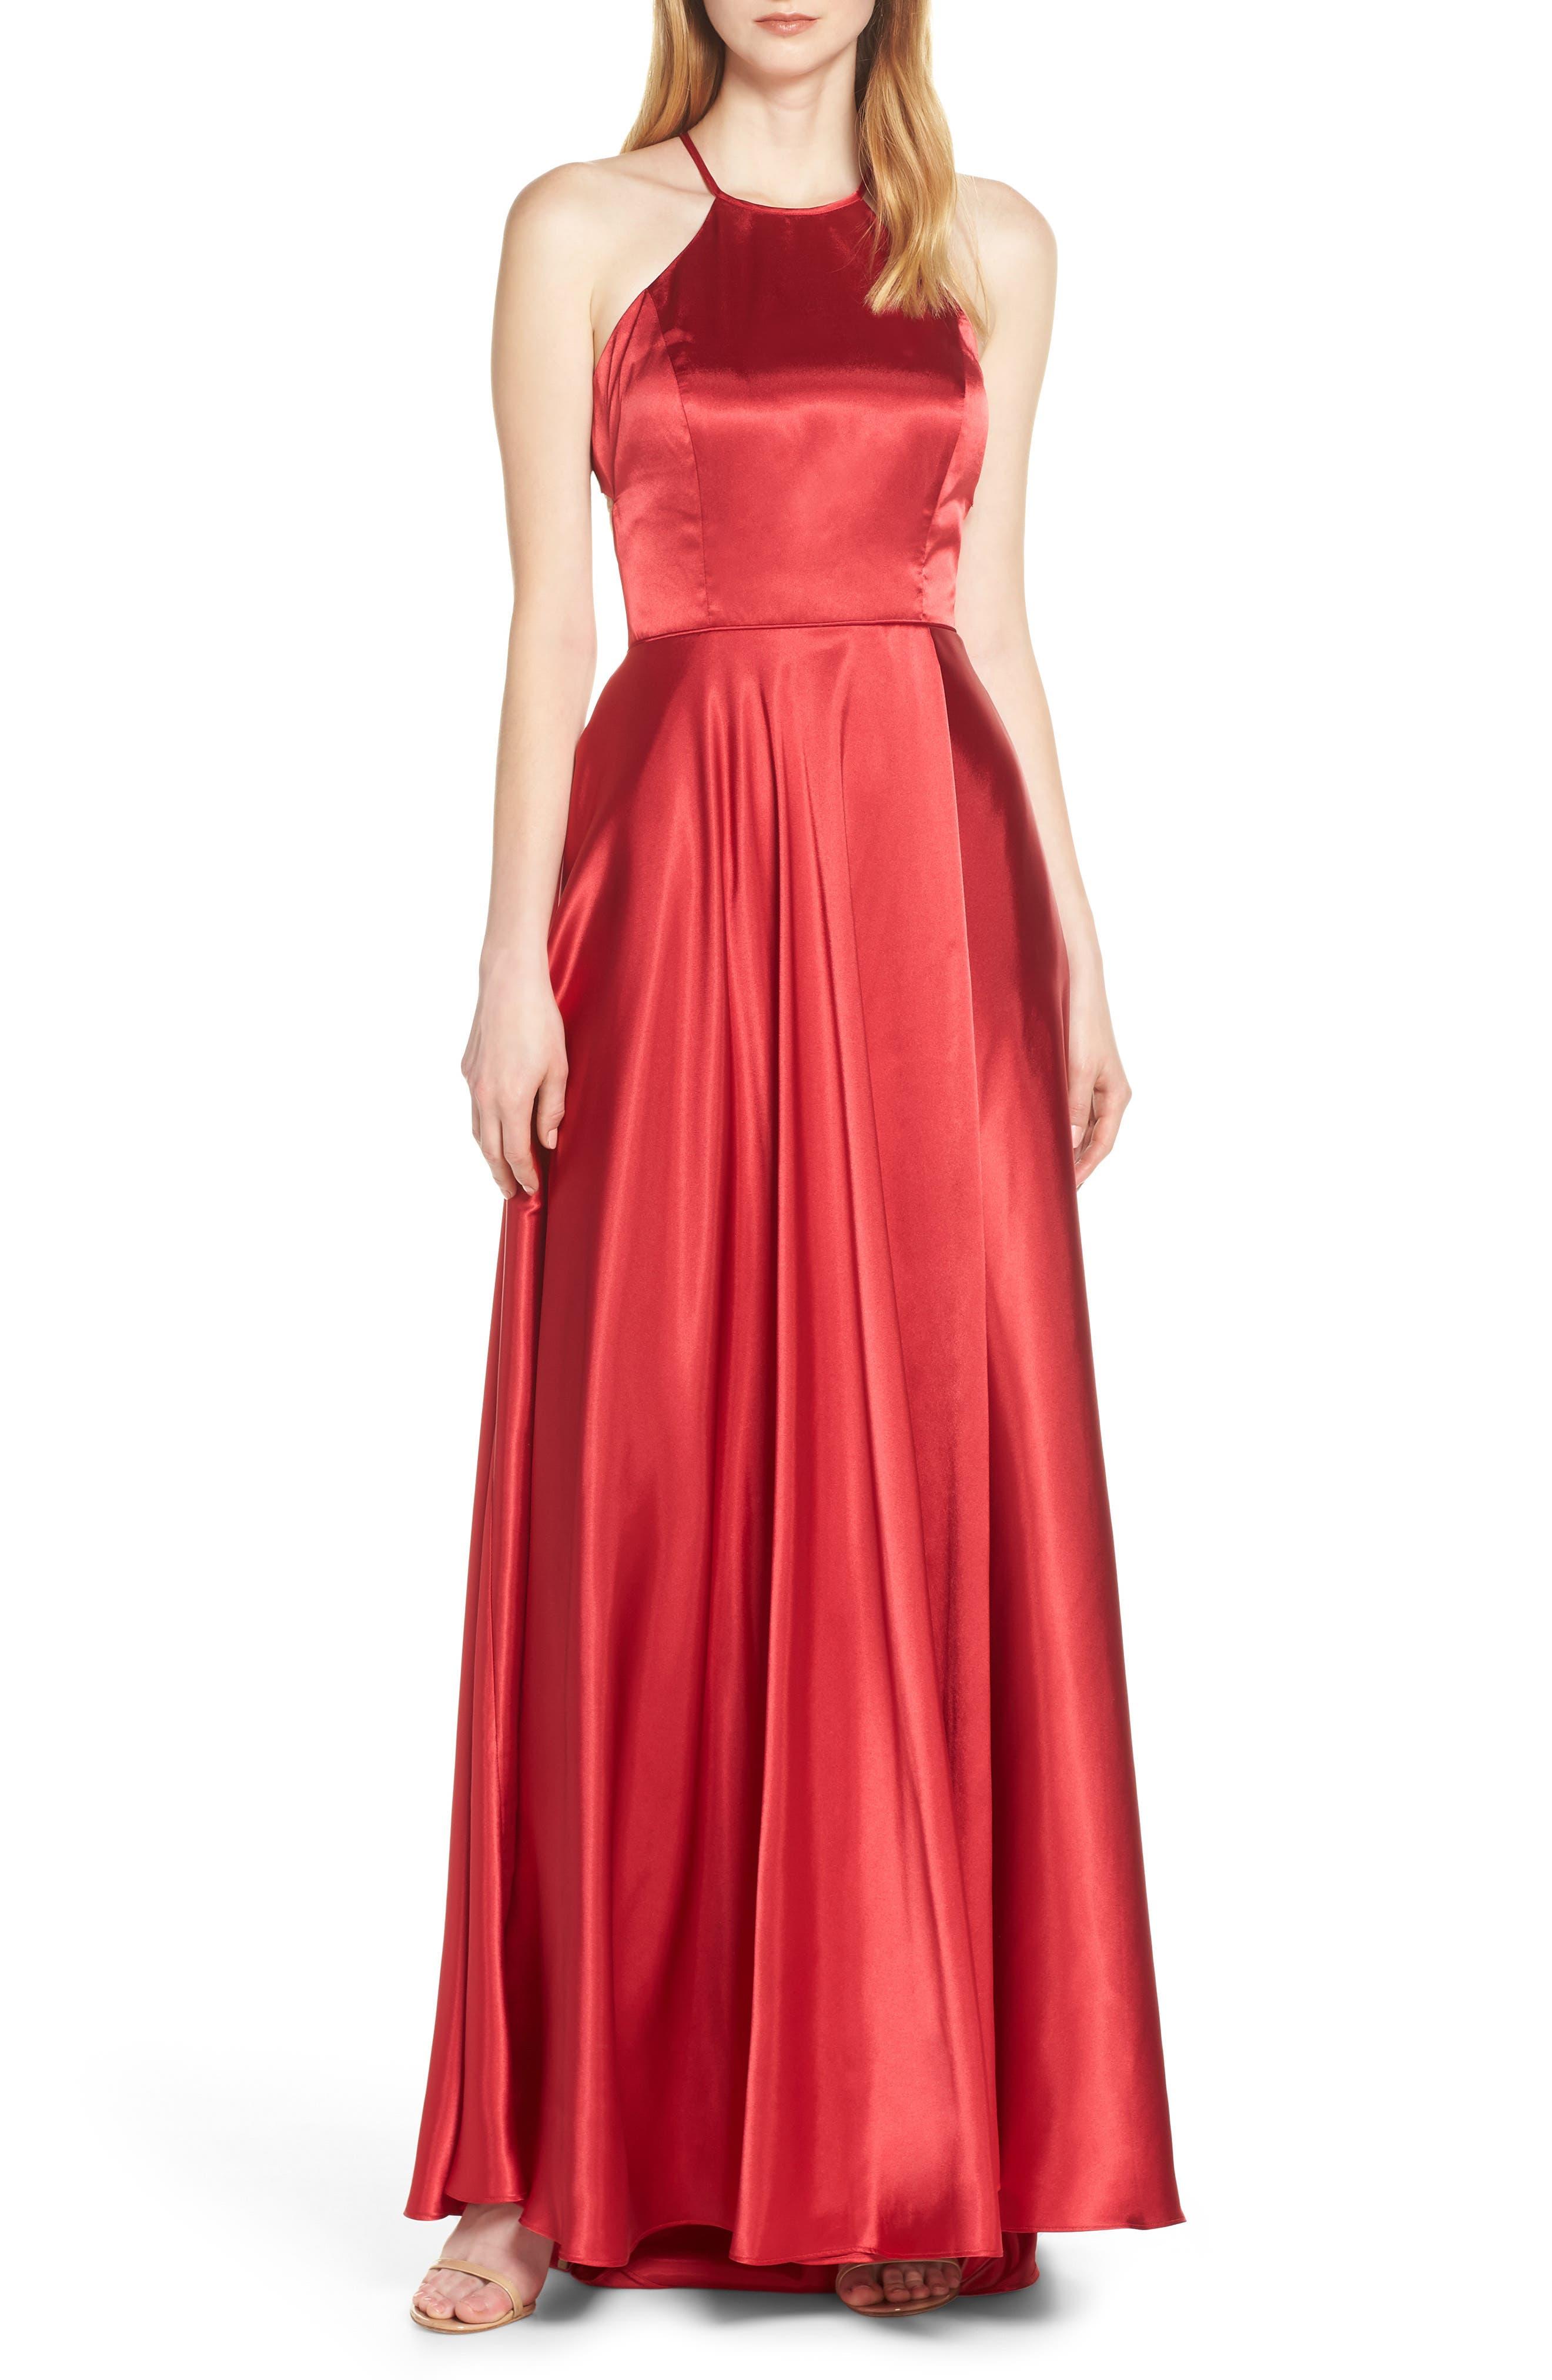 Blondie Nites Back Tie Charmeuse Evening Dress, Red